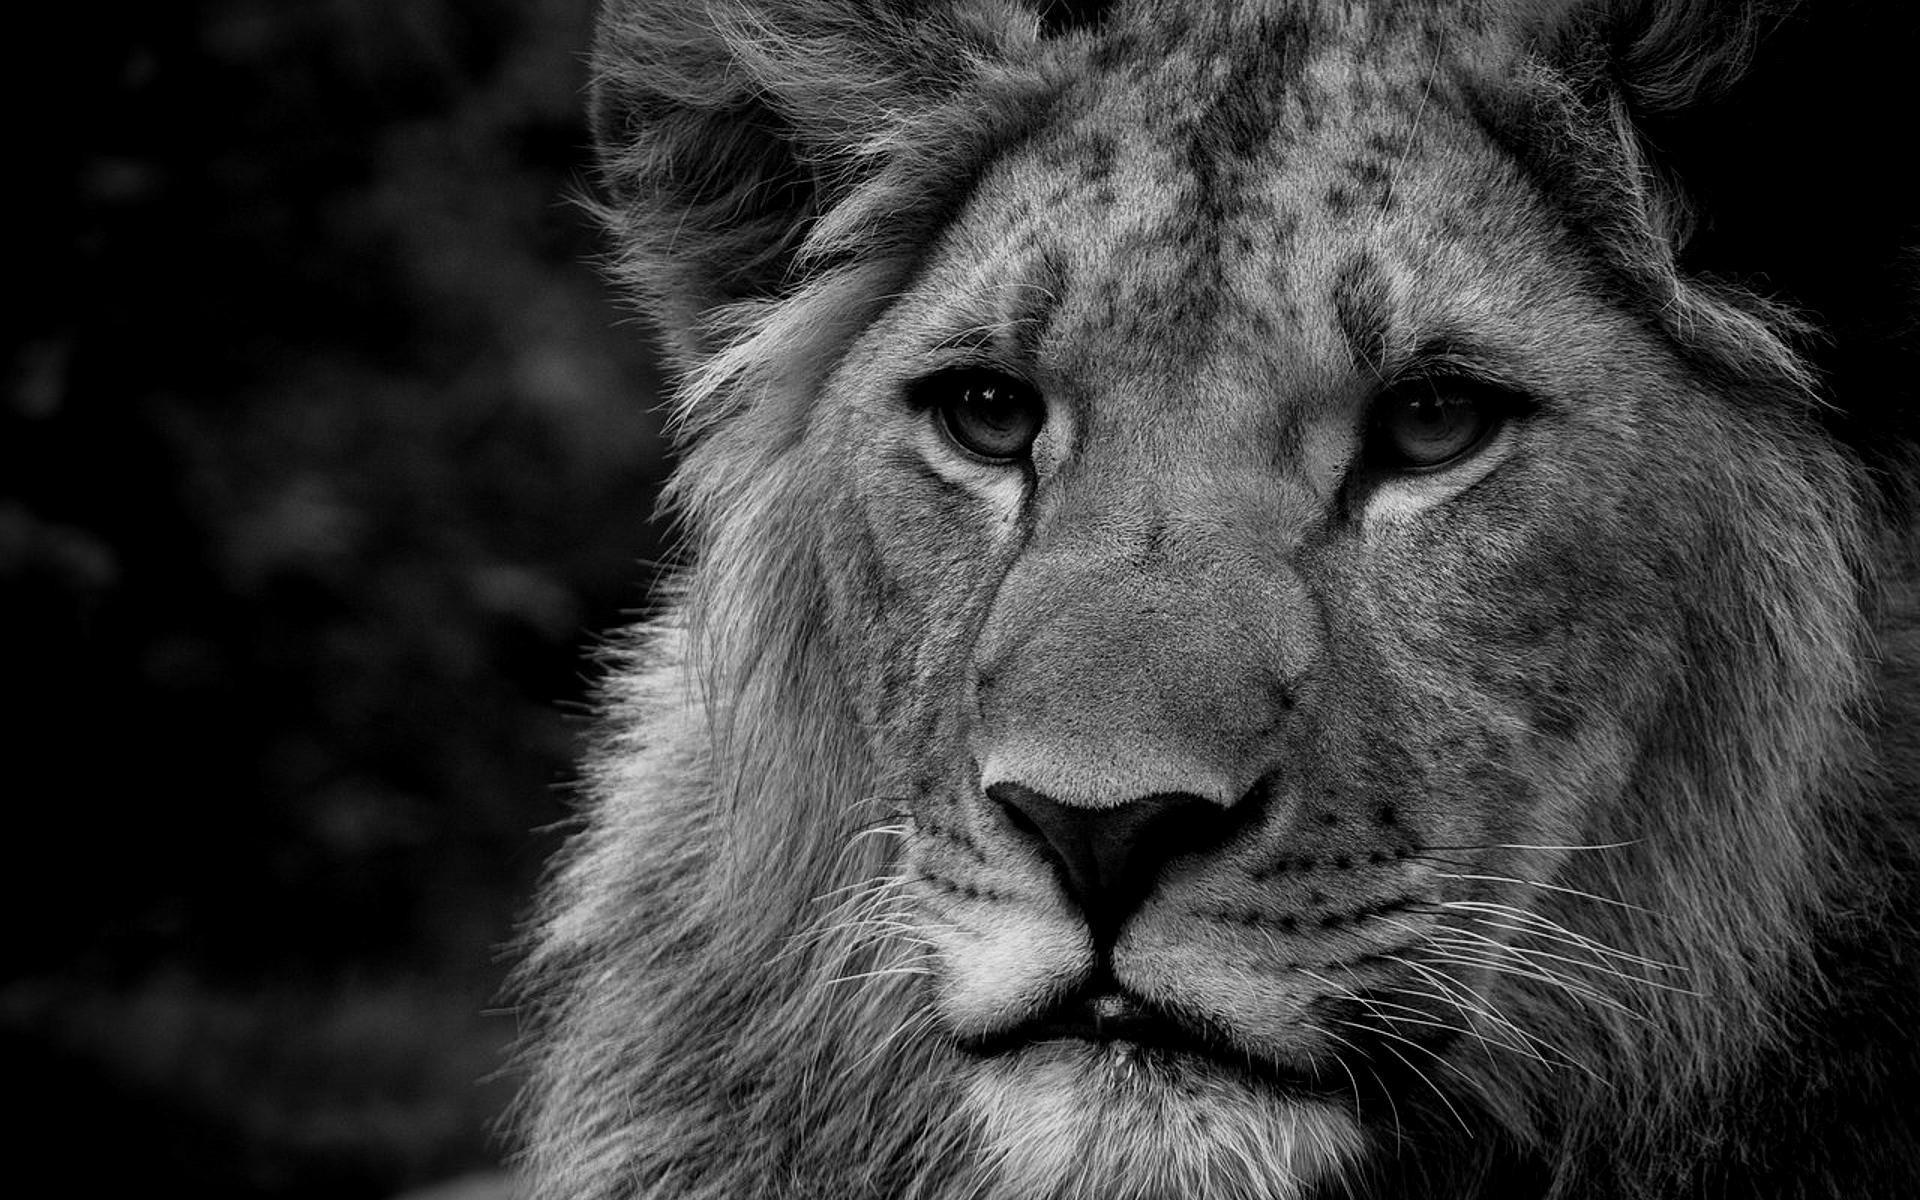 Male Lion Faces Wallpaper ·① WallpaperTag